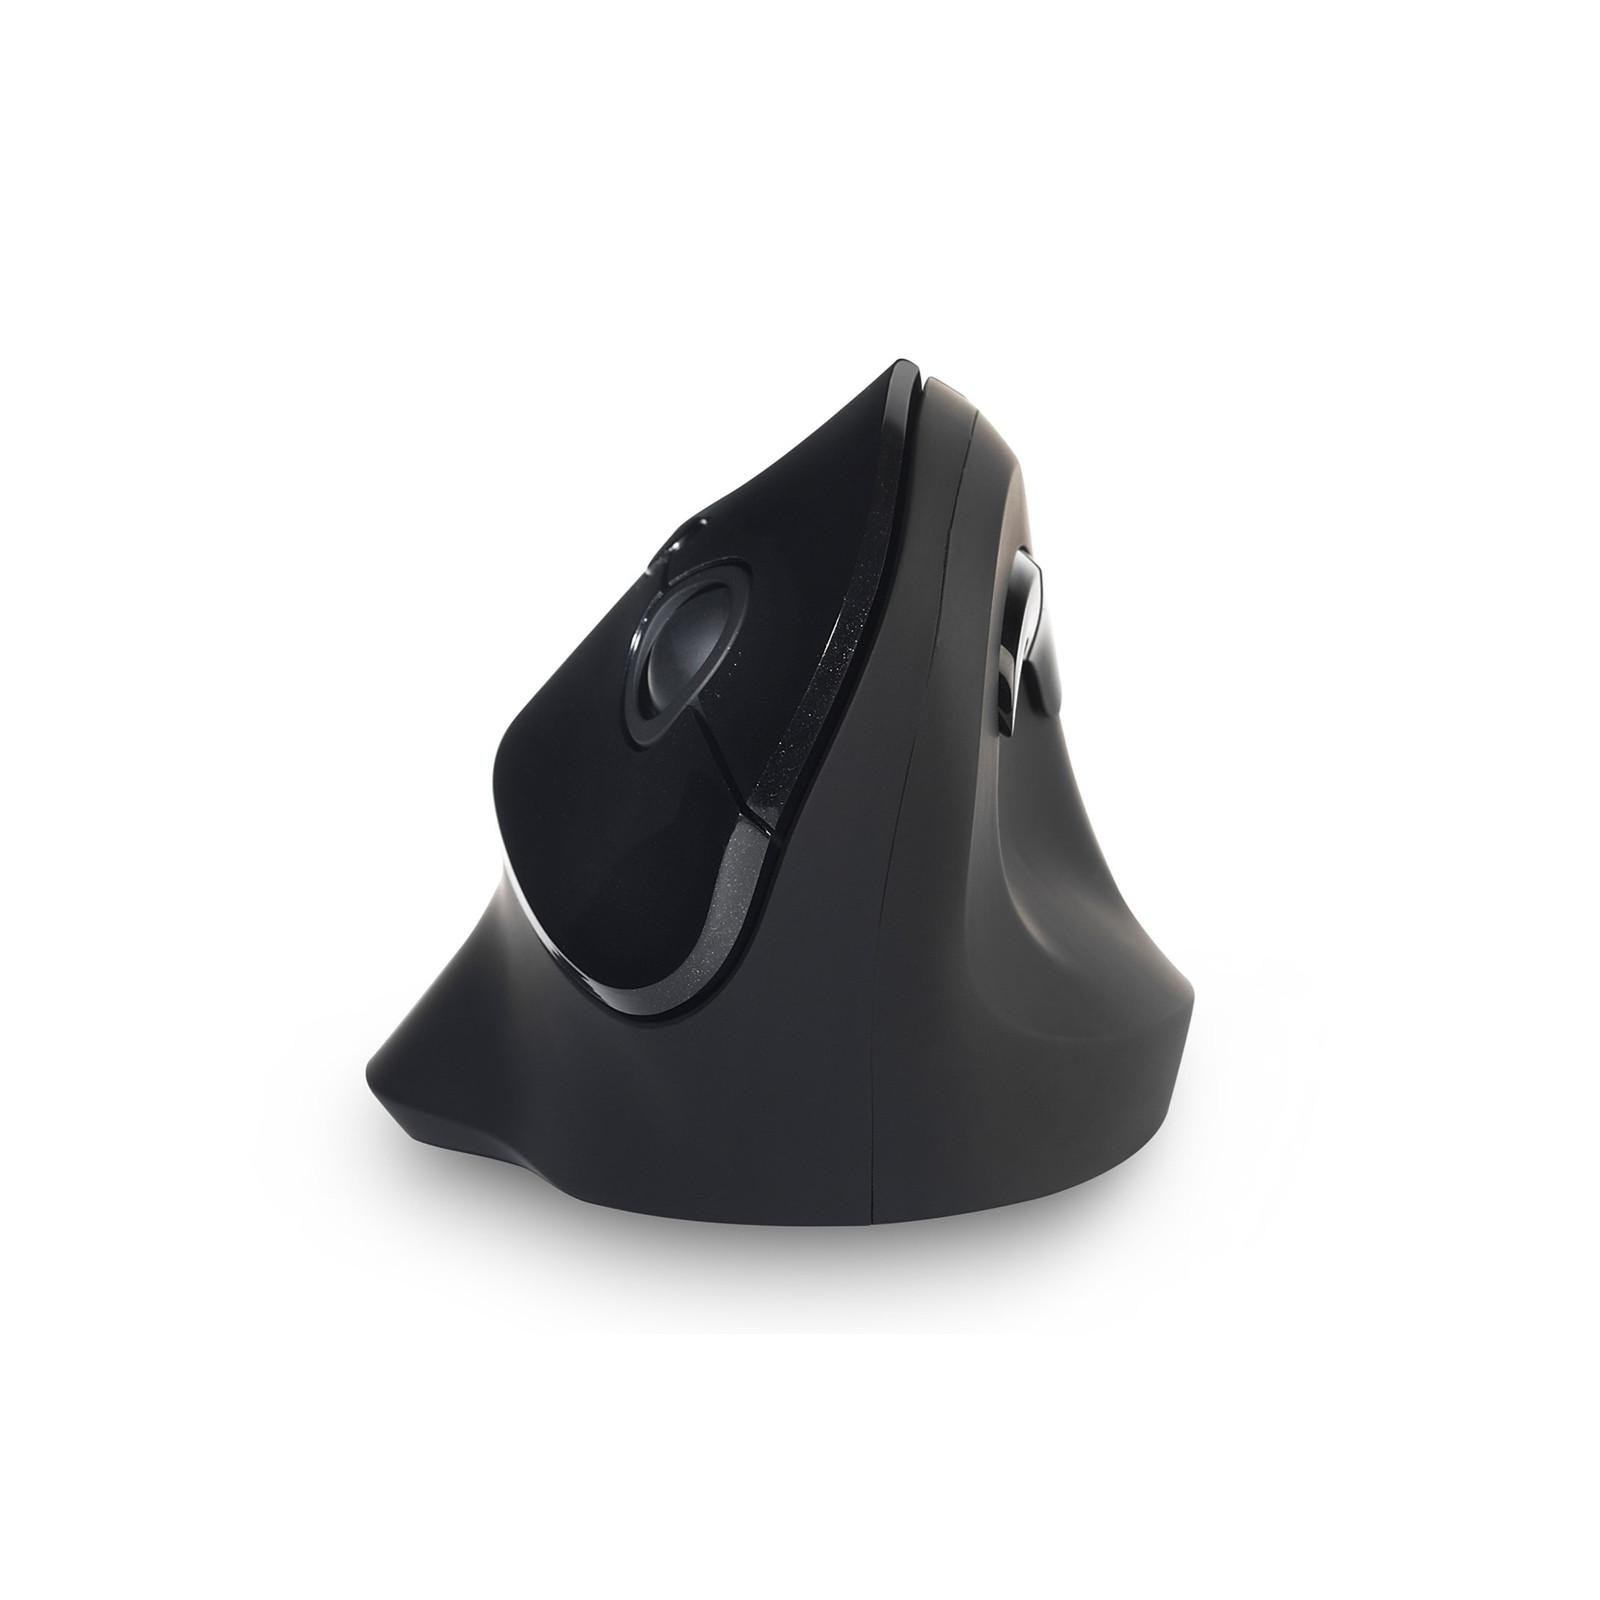 BakkerElkhuizen PRF Mouse wireless vertical mouse